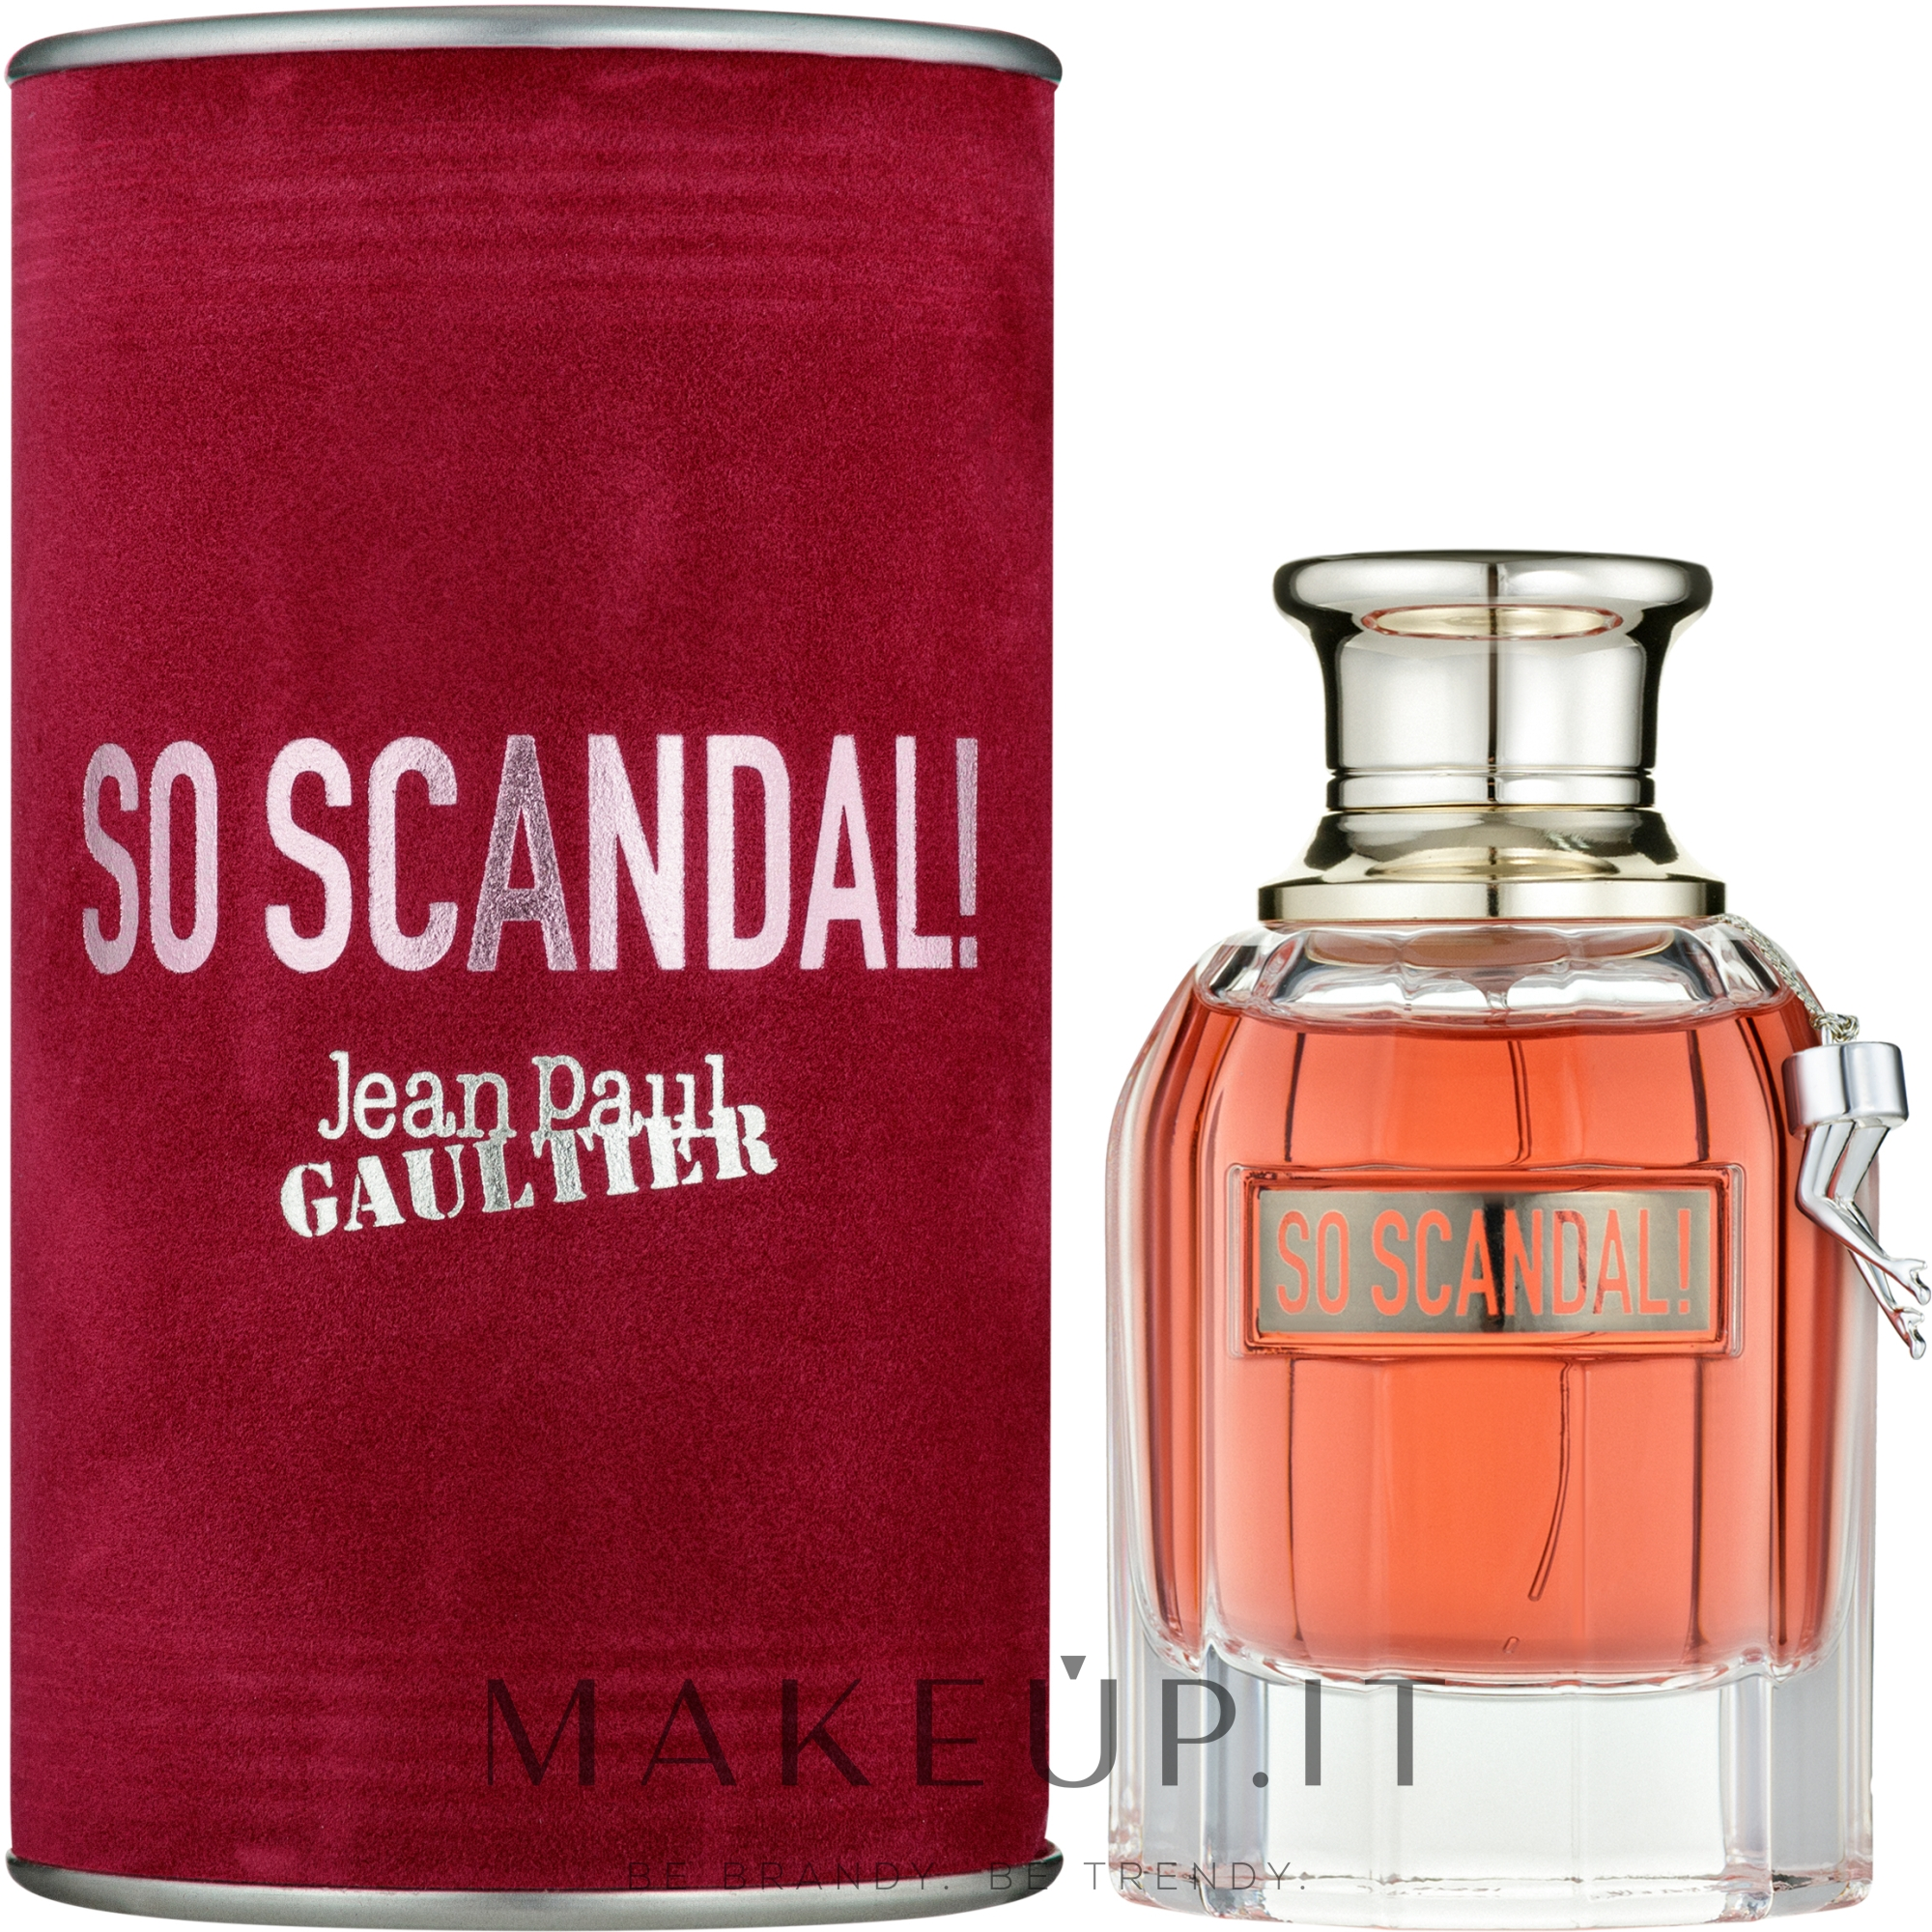 Jean Paul Gaultier So Scandal - Eau de parfum — foto 30 ml